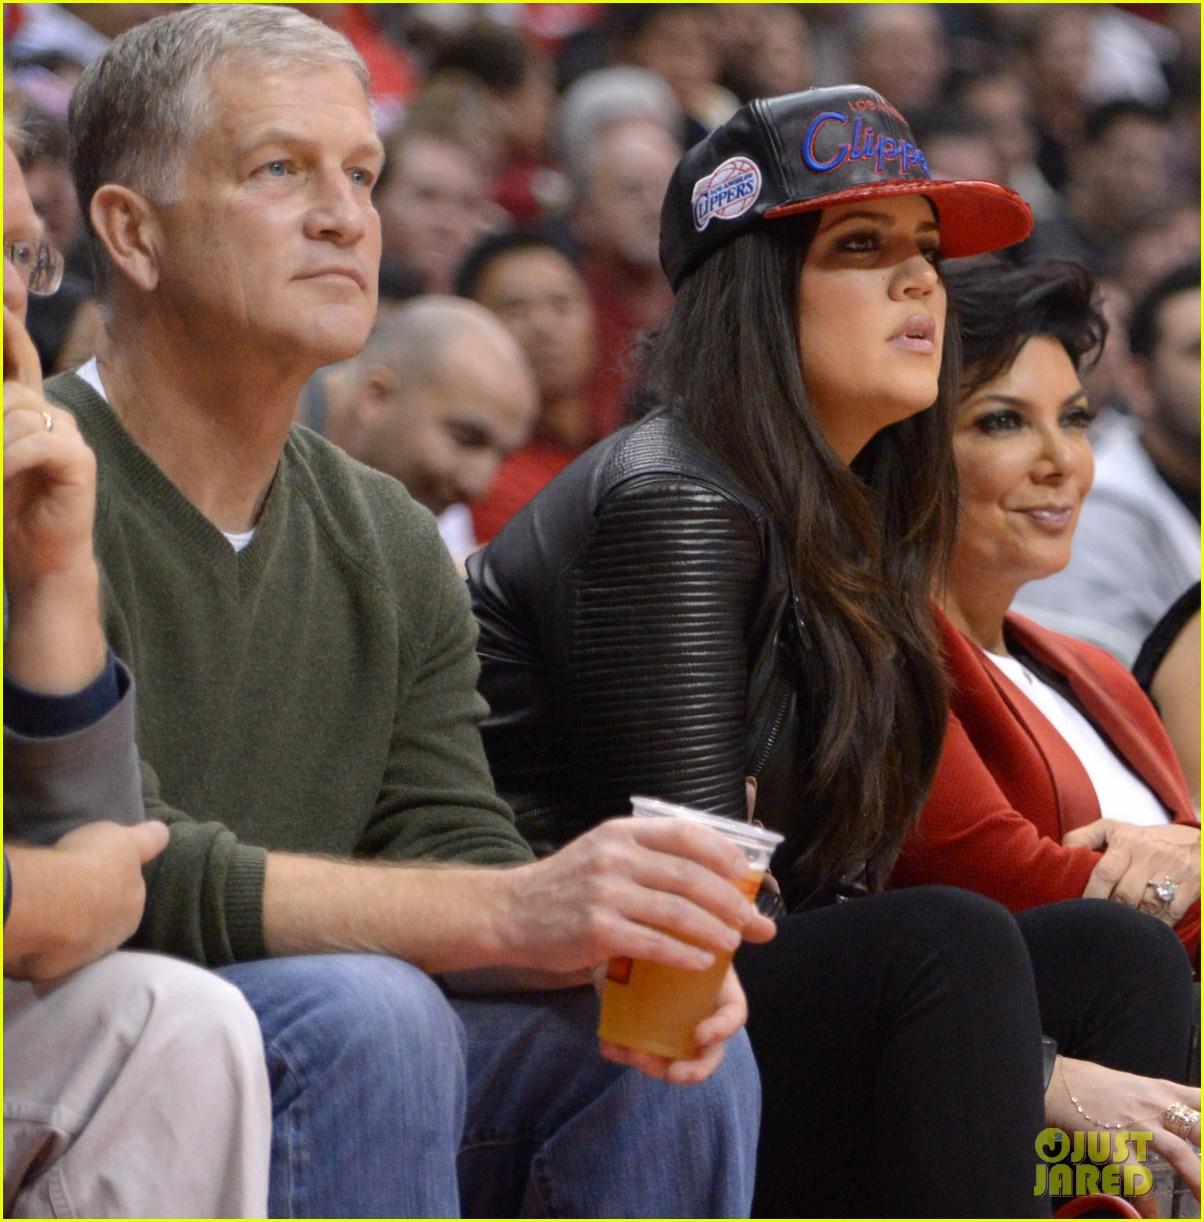 Denver Nuggets On Hulu: Kim Kardashian & Kanye West: Christmas Clippers Game